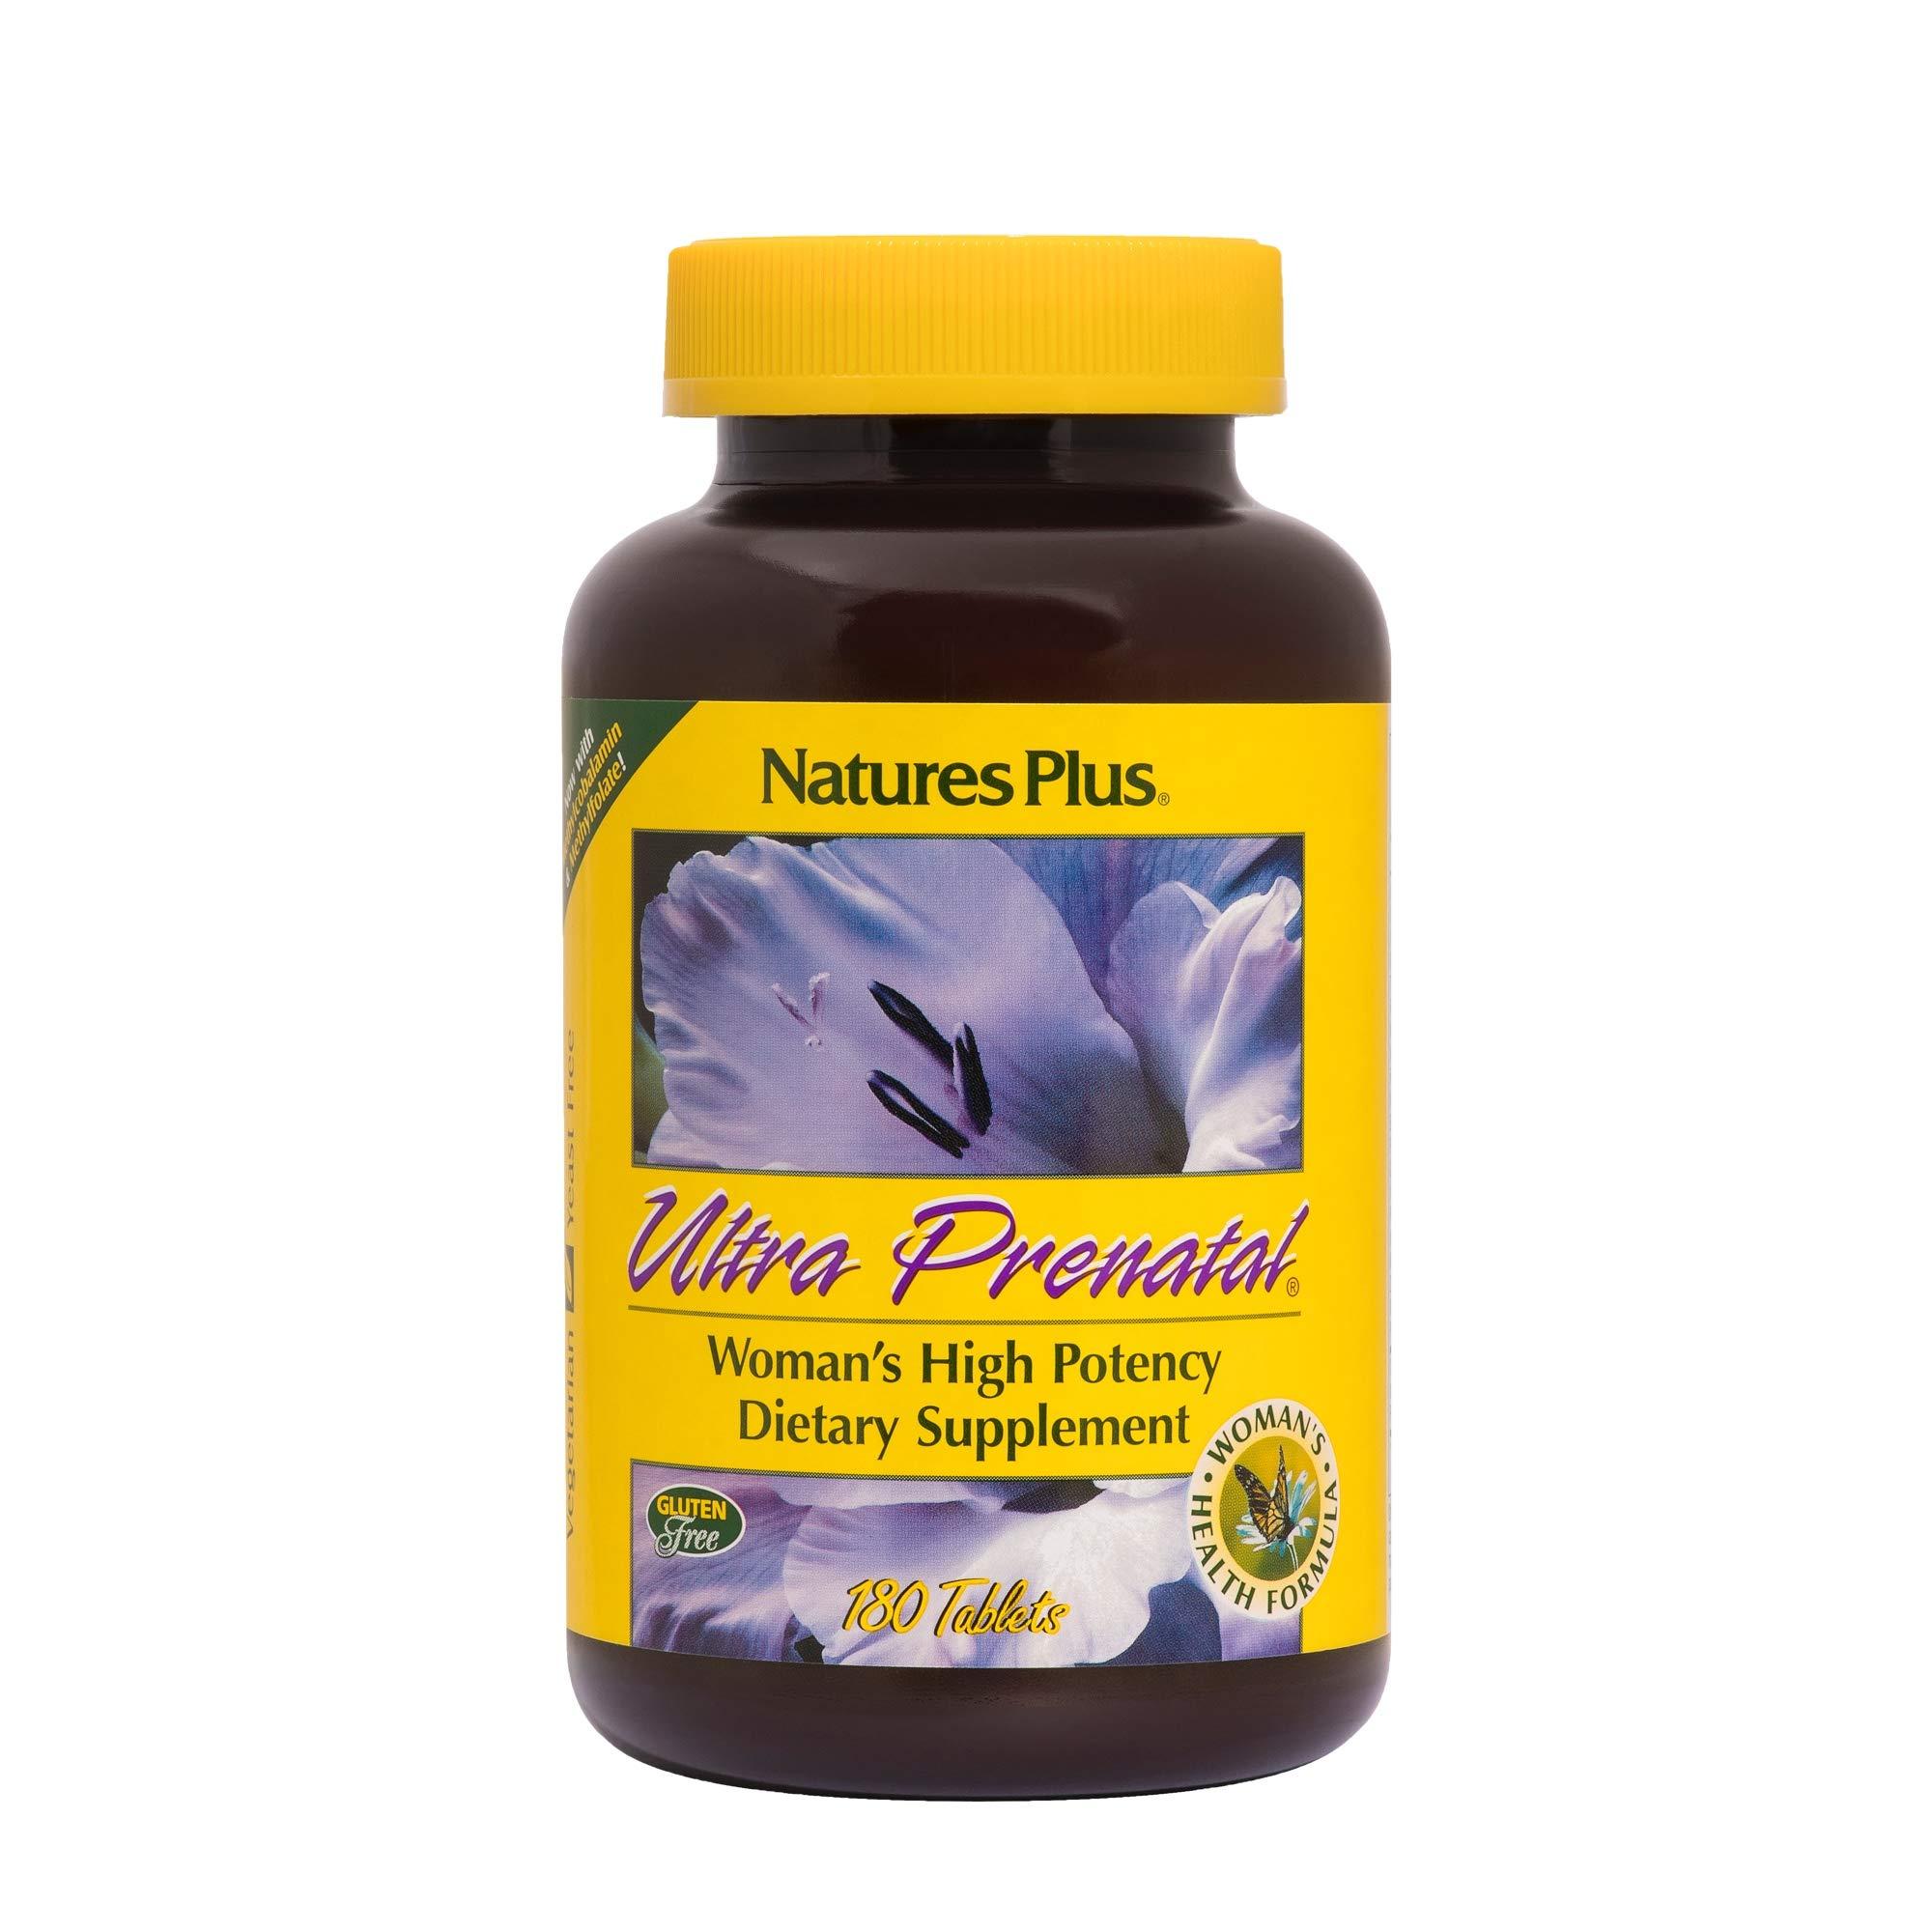 NaturesPlus Ultra Prenatal Multivitamin - 800 mcg Folate, 180 Vegetarian Tablets - Prenatal Supplement with Iron, Iodine, Calcium & B-Complex Vitamins - Gluten-Free - 90 Servings